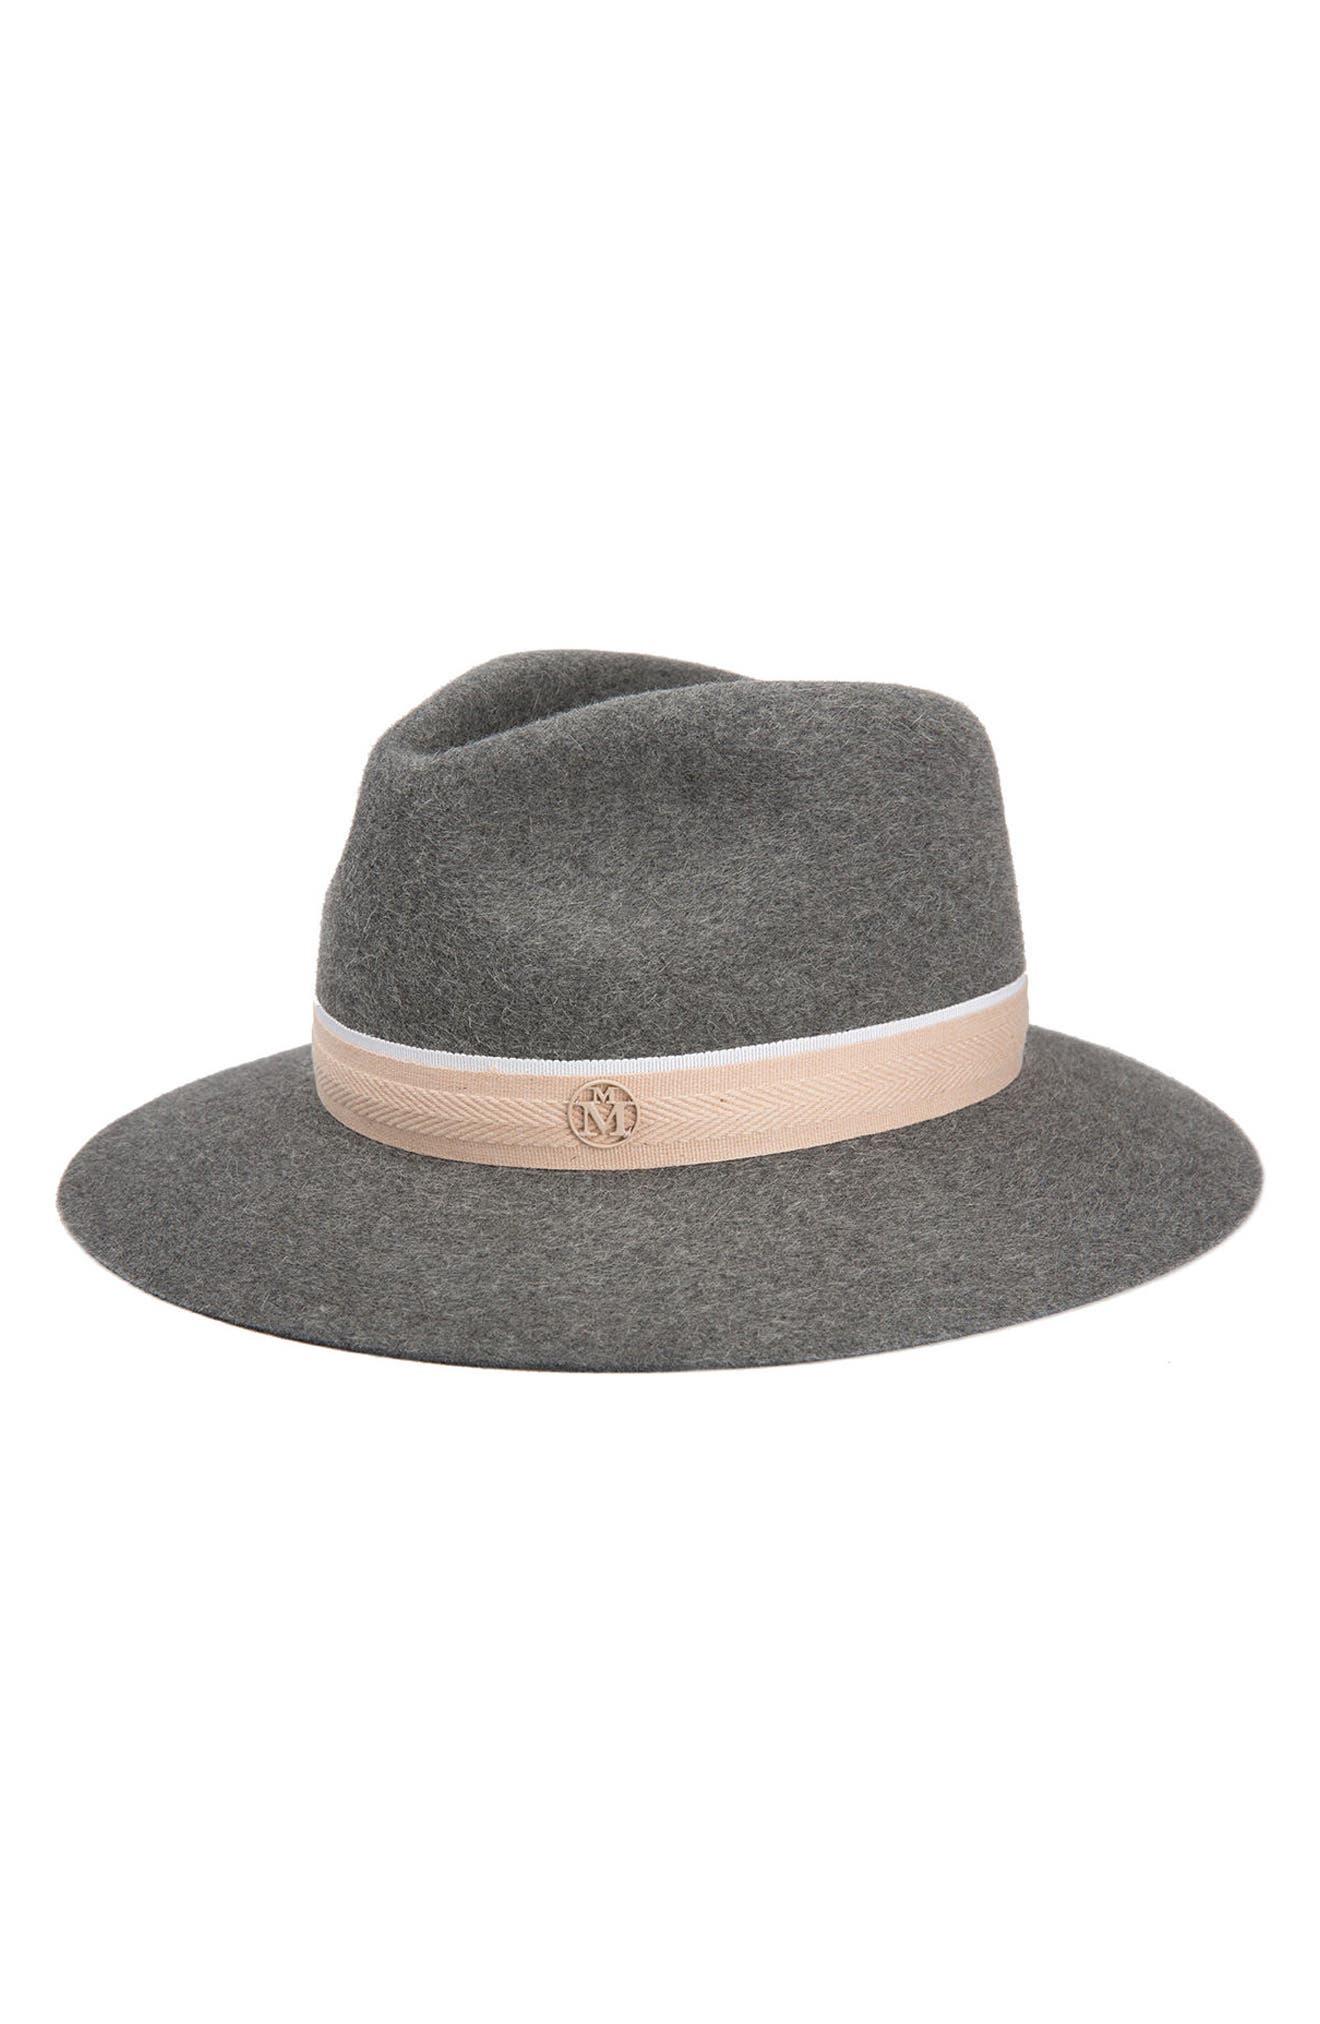 Rico Fur Felt Hat,                             Main thumbnail 1, color,                             020